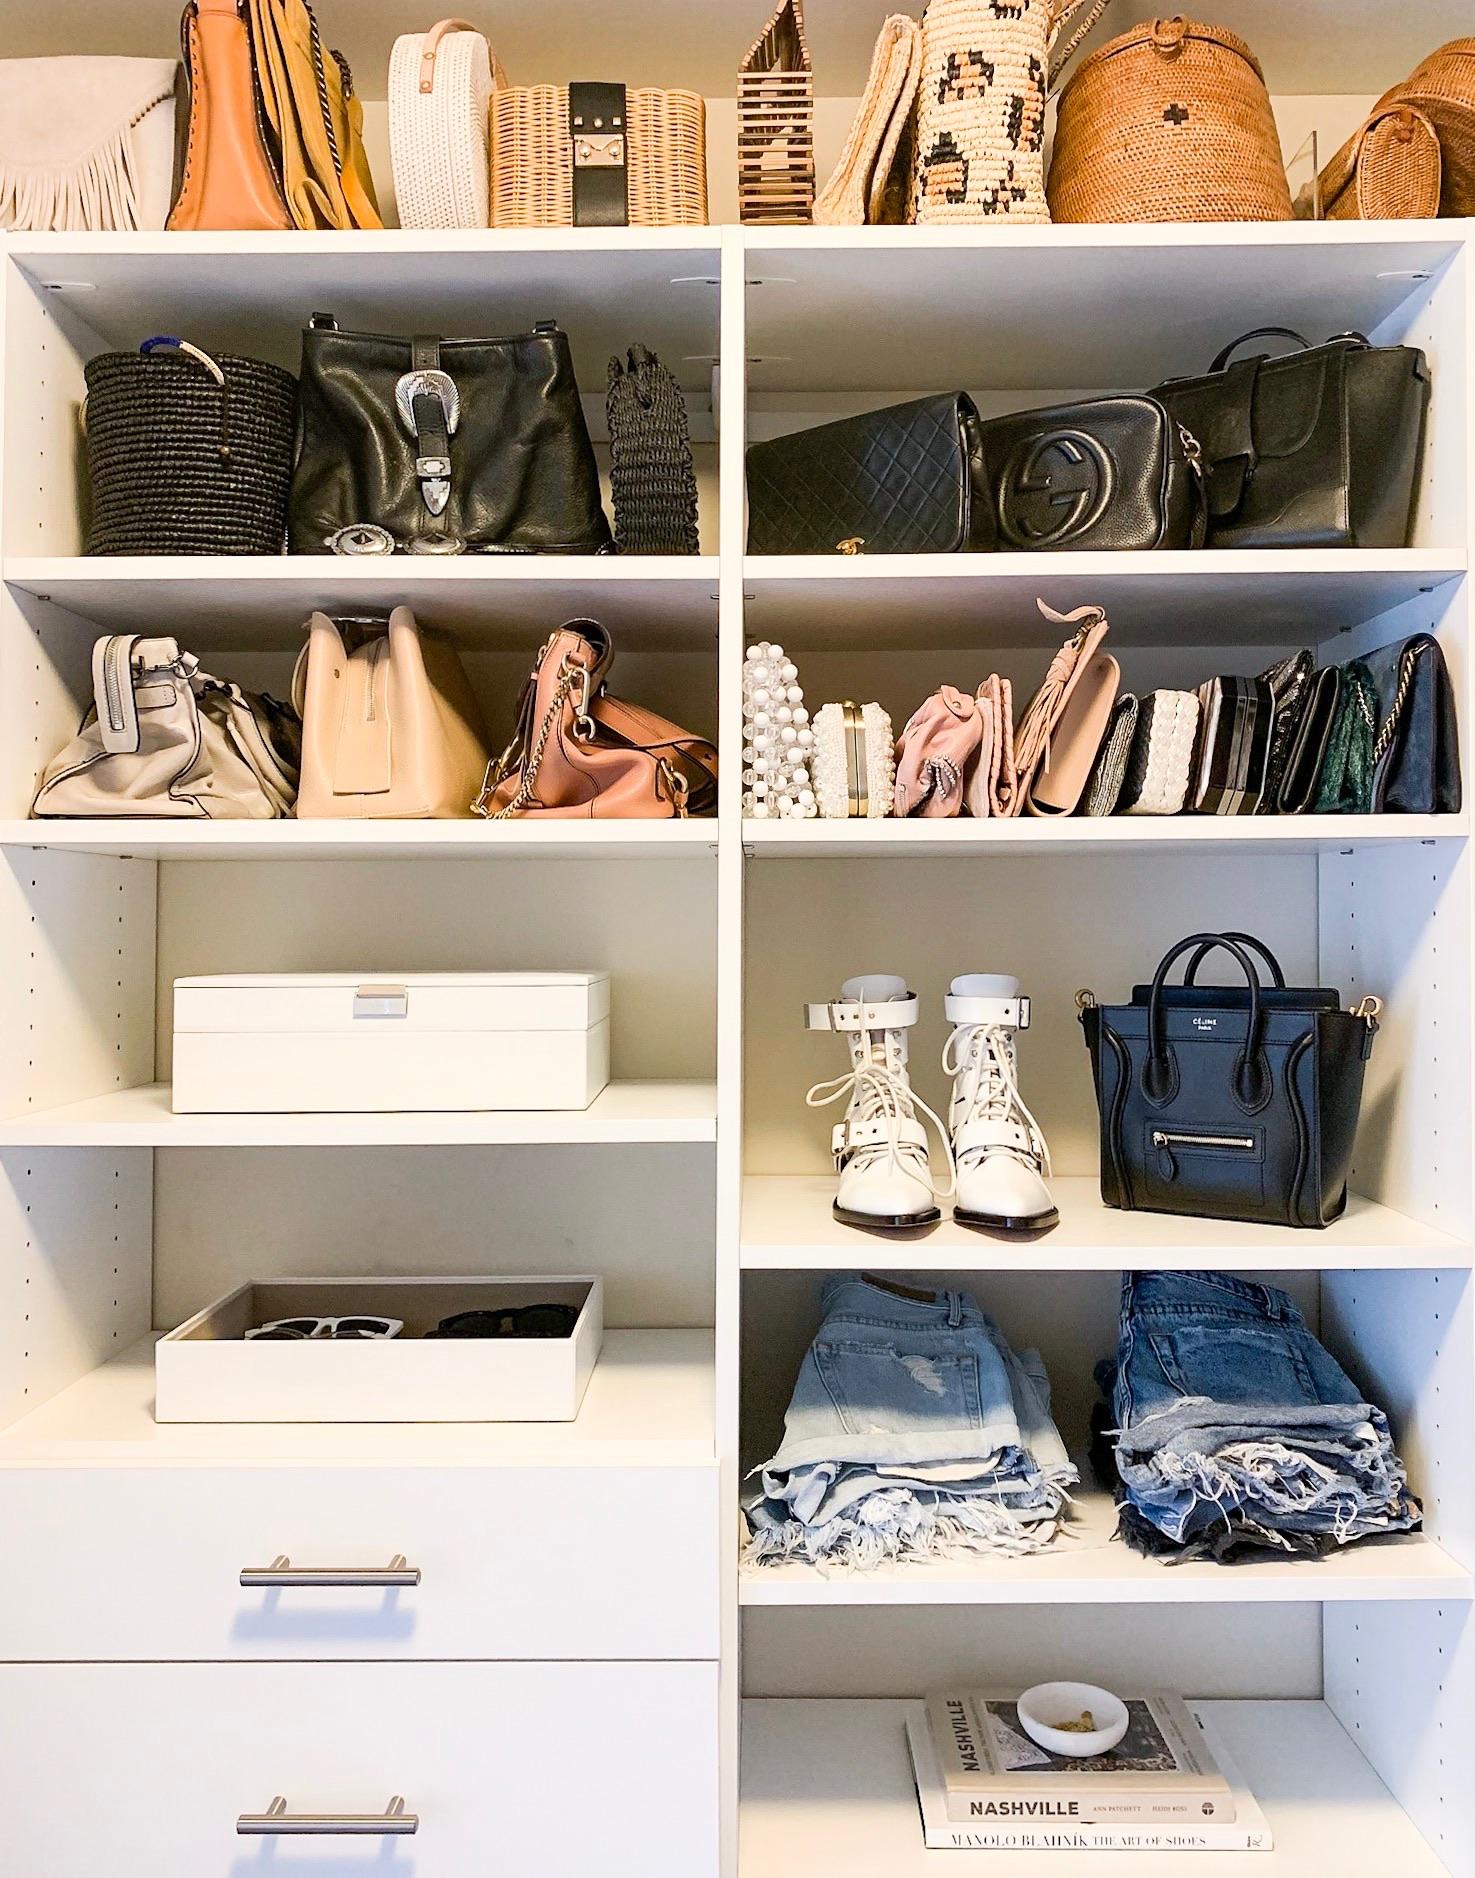 lauren bushnell closet life in jeneral